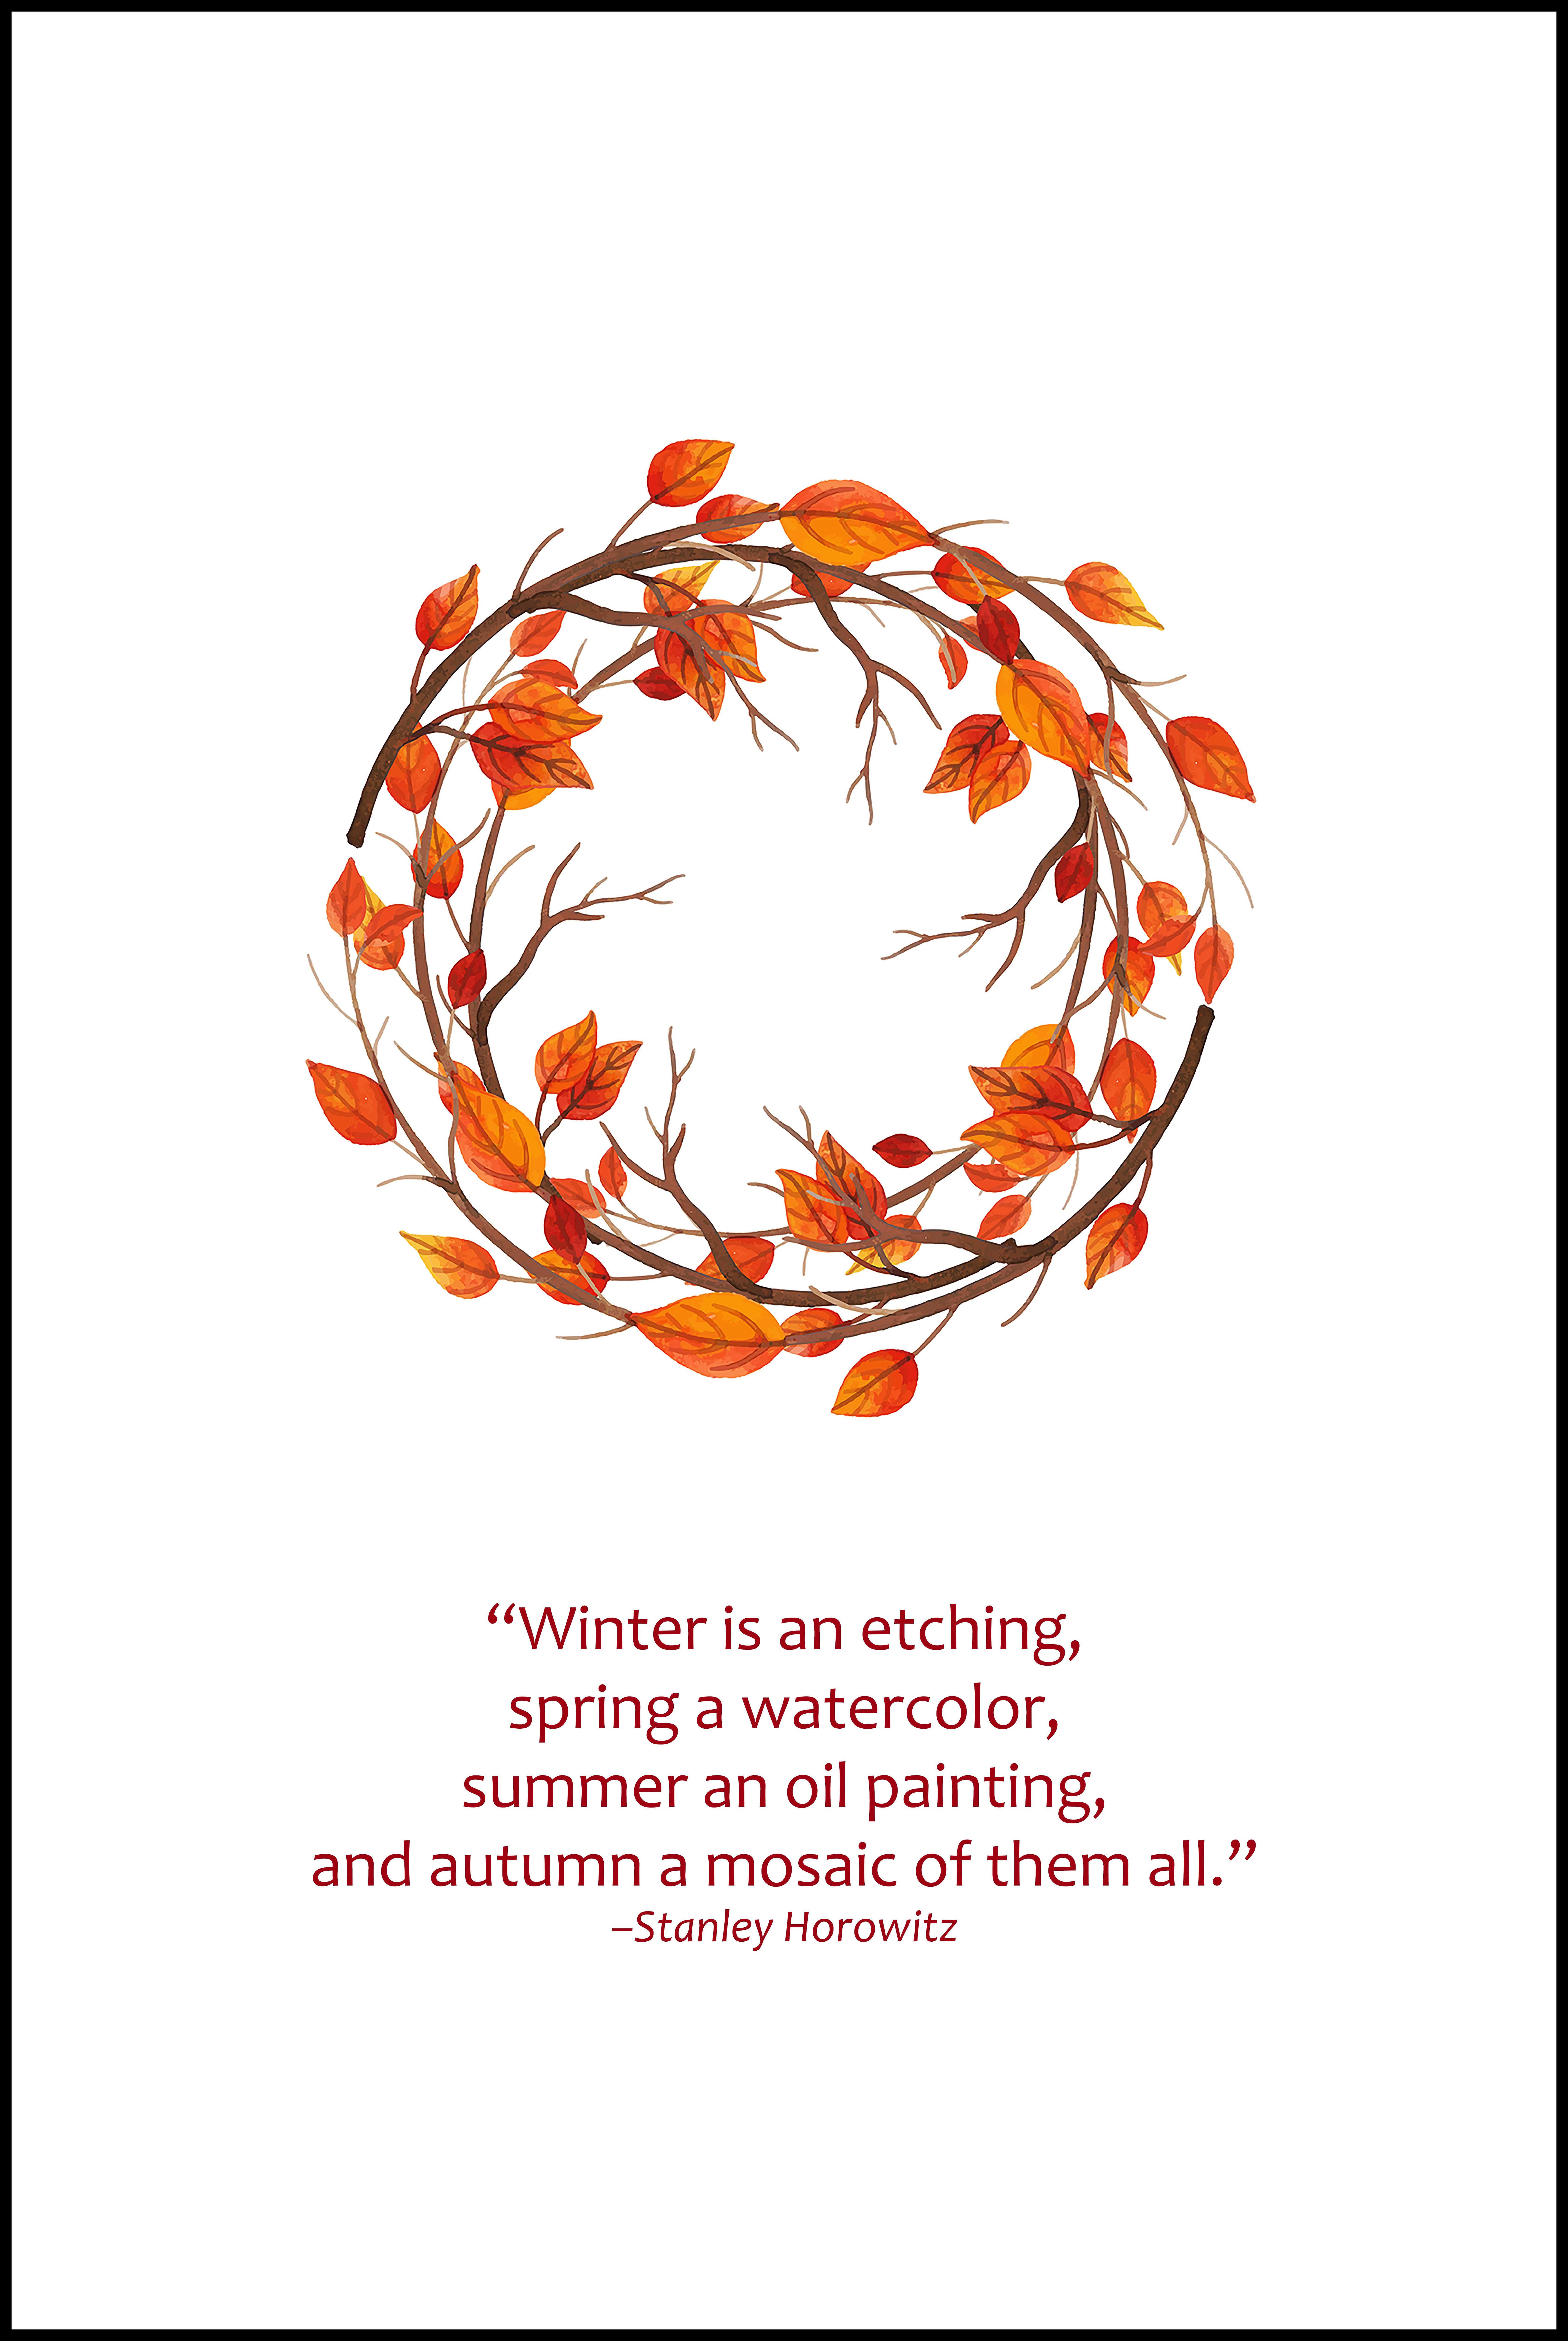 Autumn Mosaic Stanley Horowitz Quote